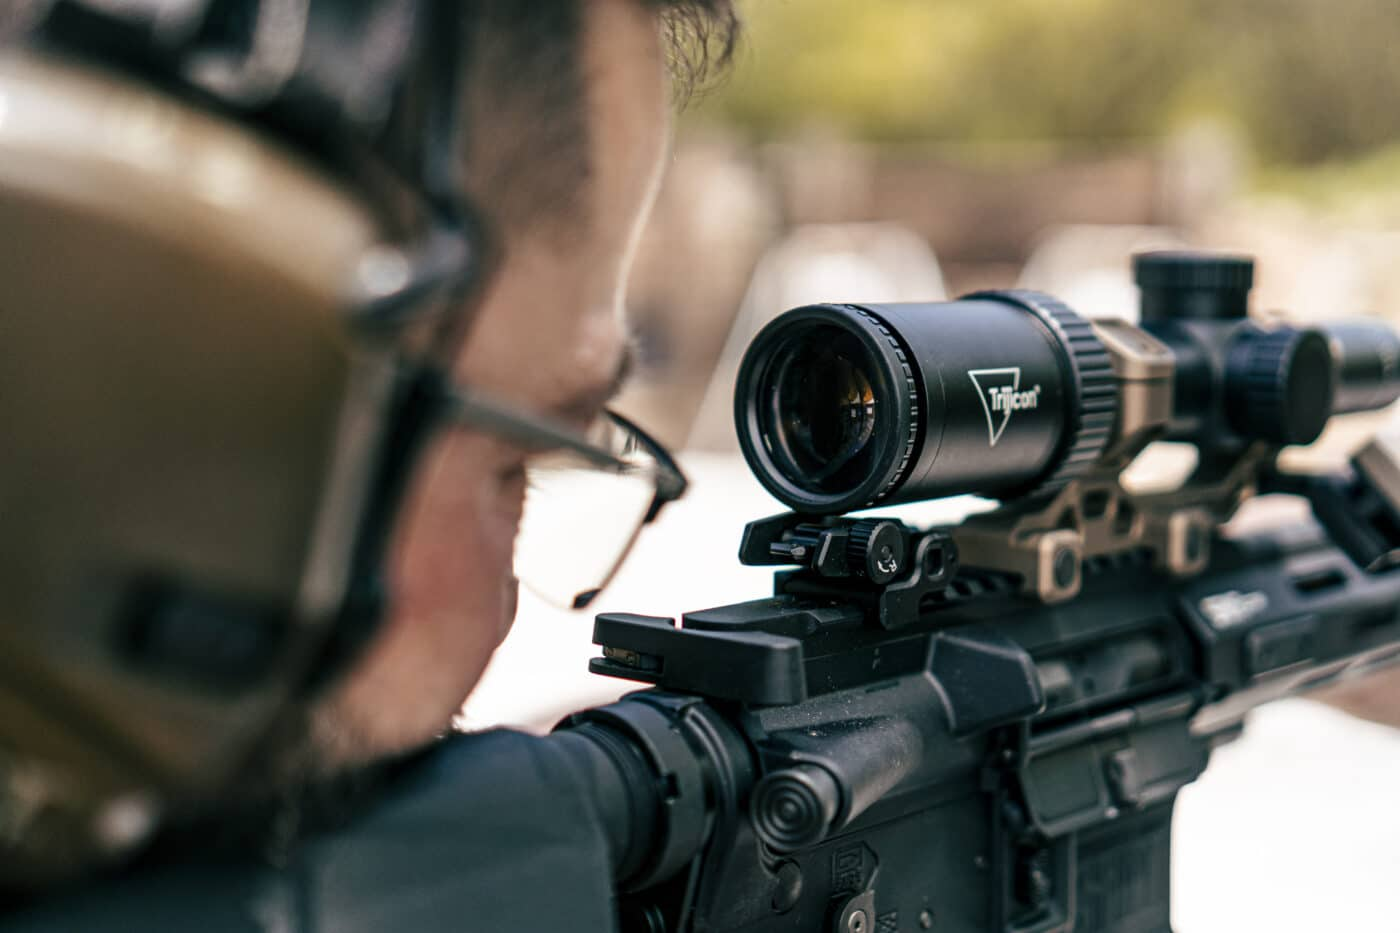 Eye relief on the Trijicon HX scope